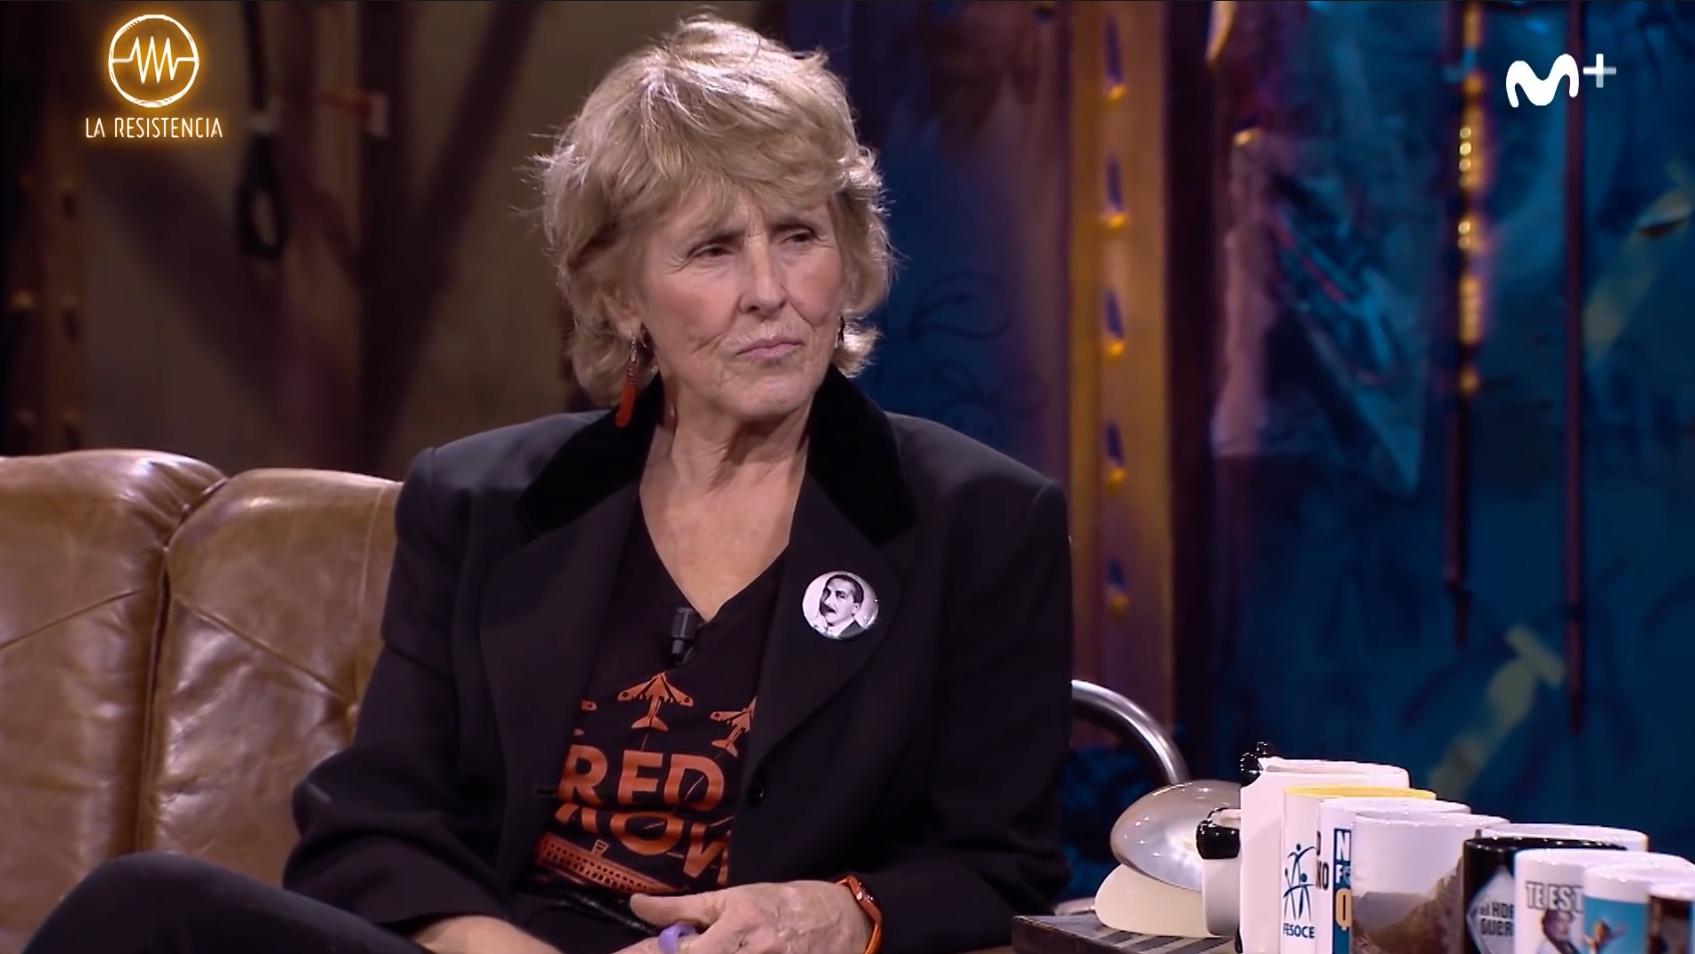 Mercedes Milá a 'La Resistencia' - Movistar +